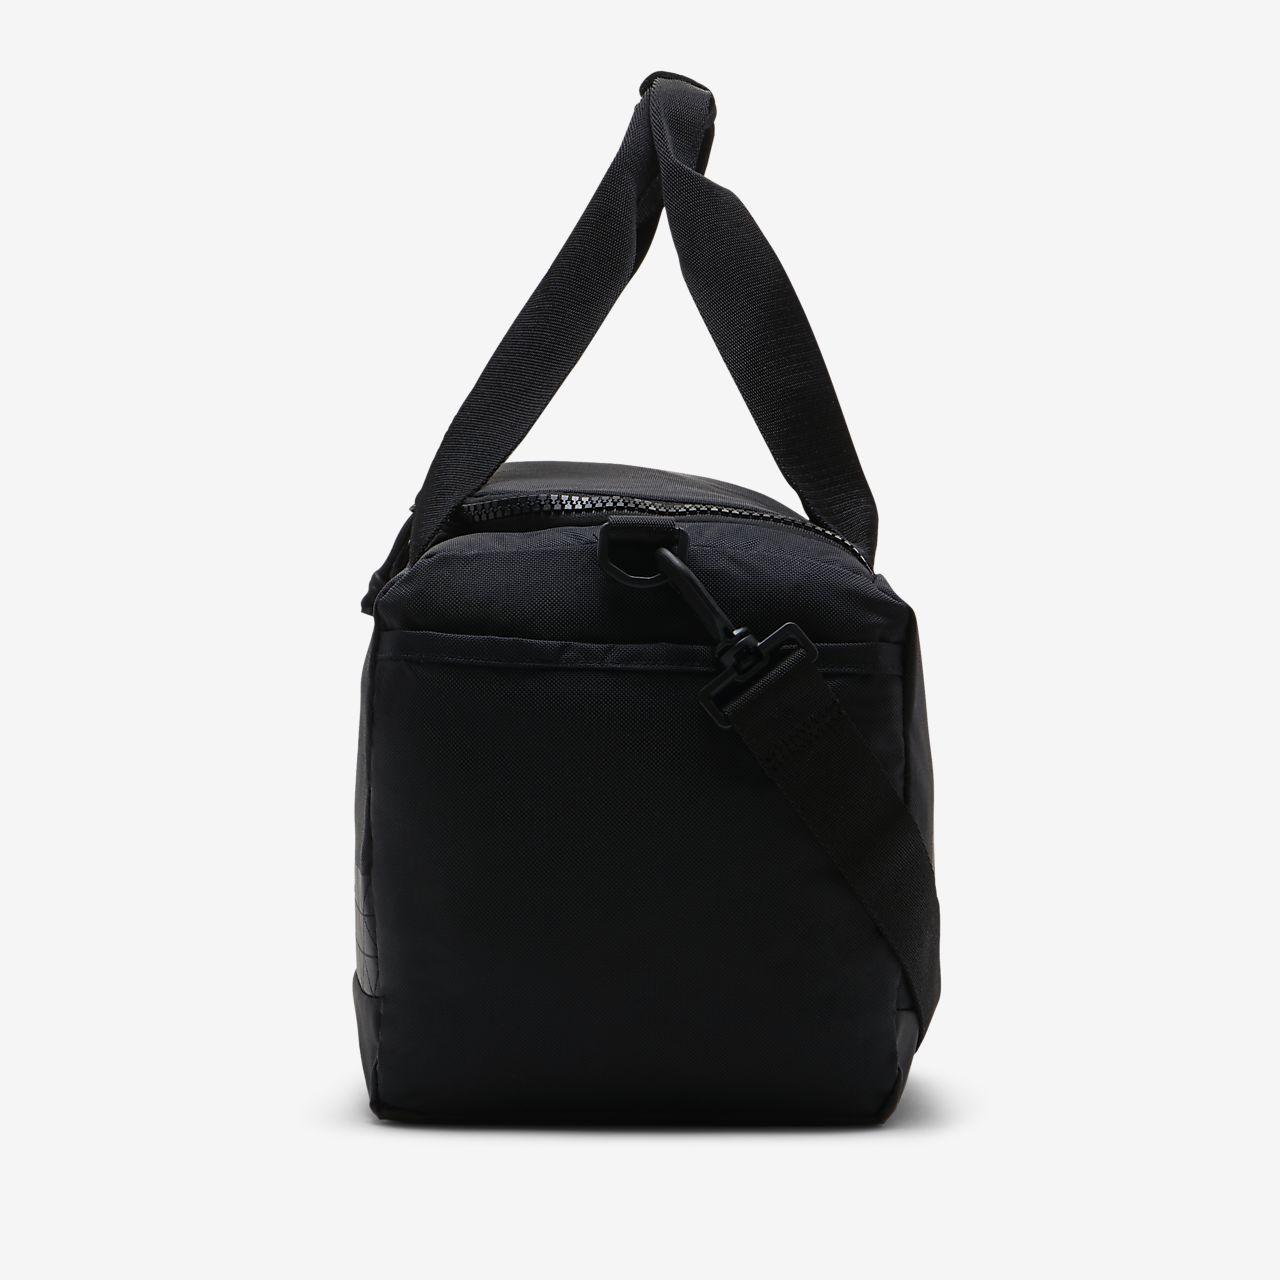 NIKE Vapor Jet Drum Bag Unisex